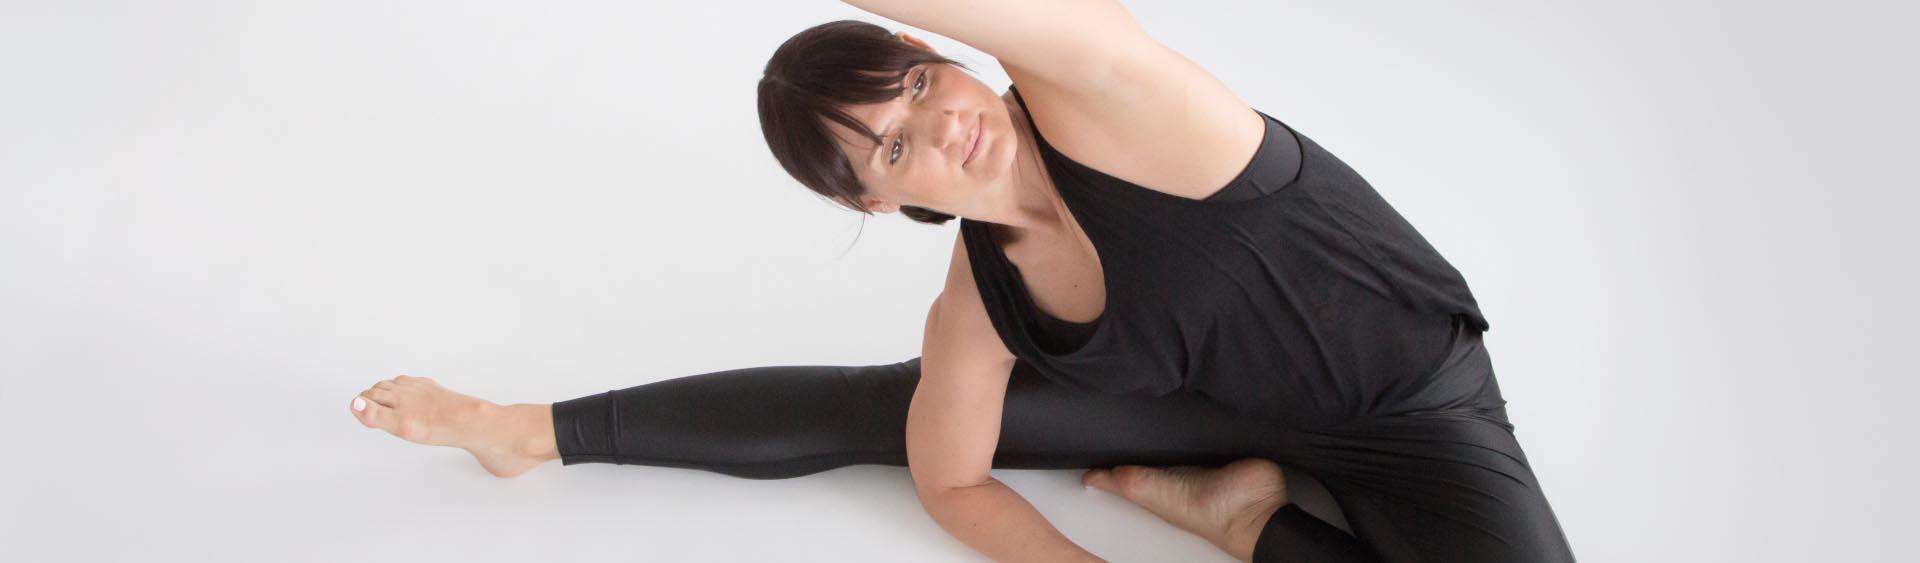 Yin Yoga Ausbildung Zum Yoga Trainer Safs Beta